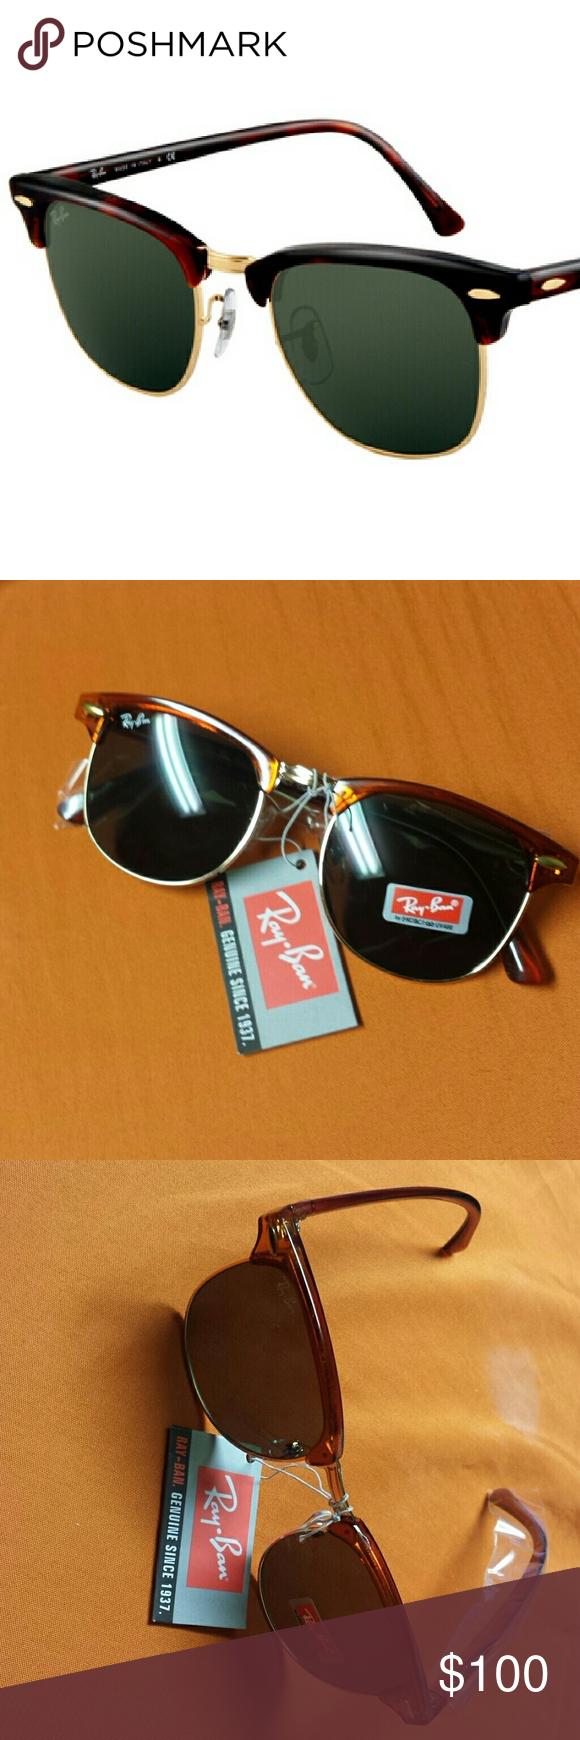 Ray Ban Clubmaster Sunglasses NWT | Clubmaster sunglasses, Ray ban ...